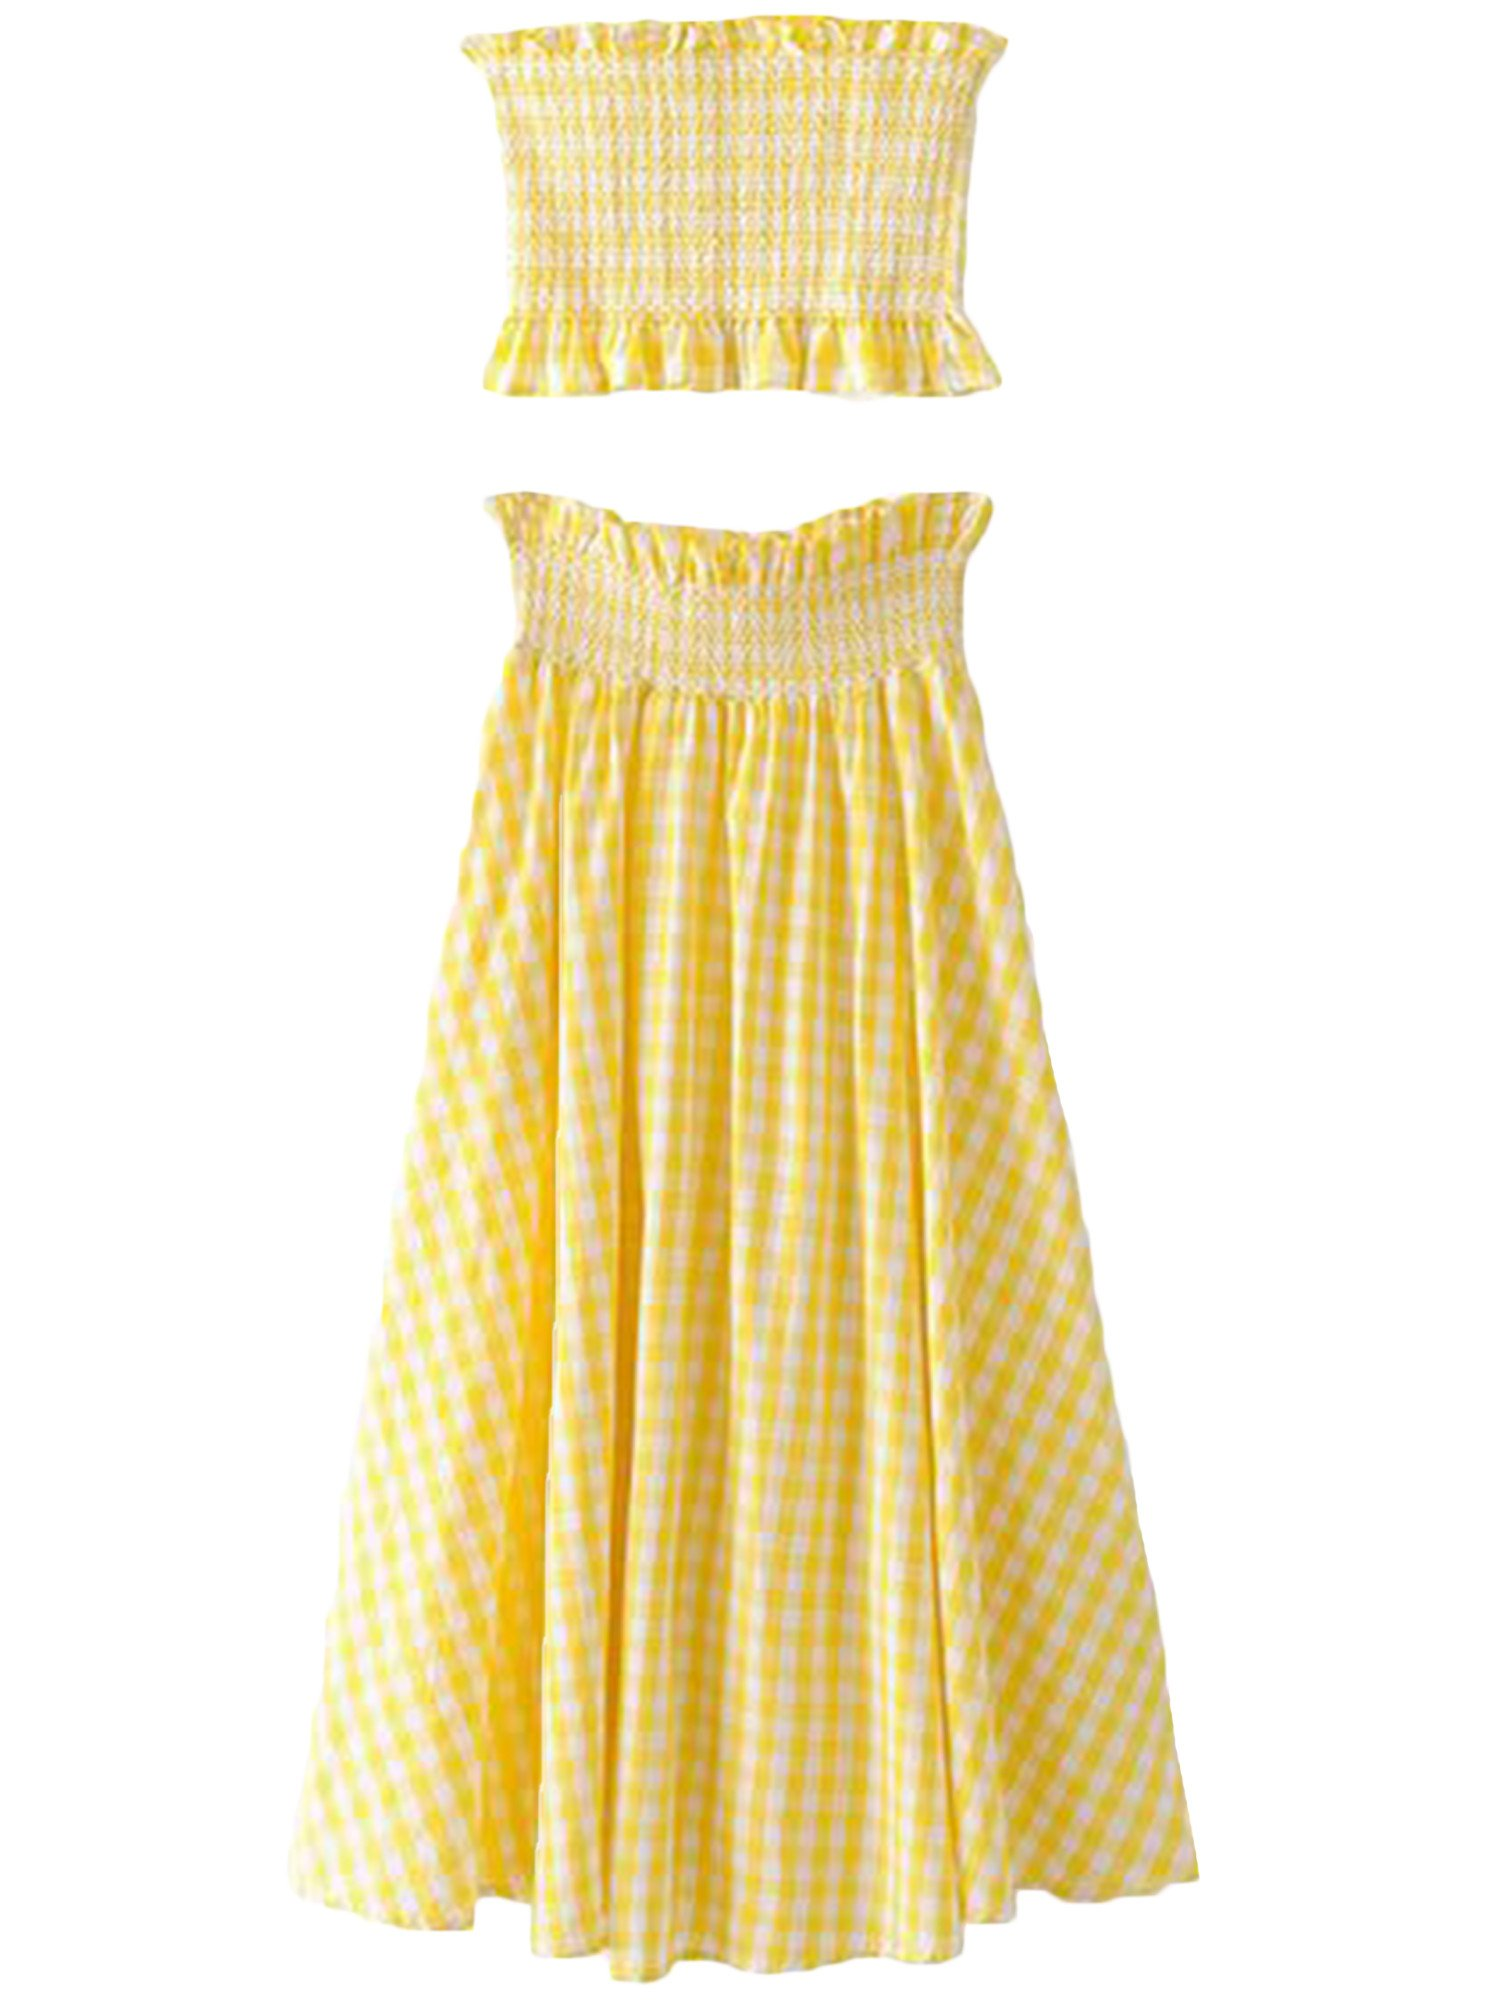 'Rita' Filly Plaid Midi Skirt Co Ords